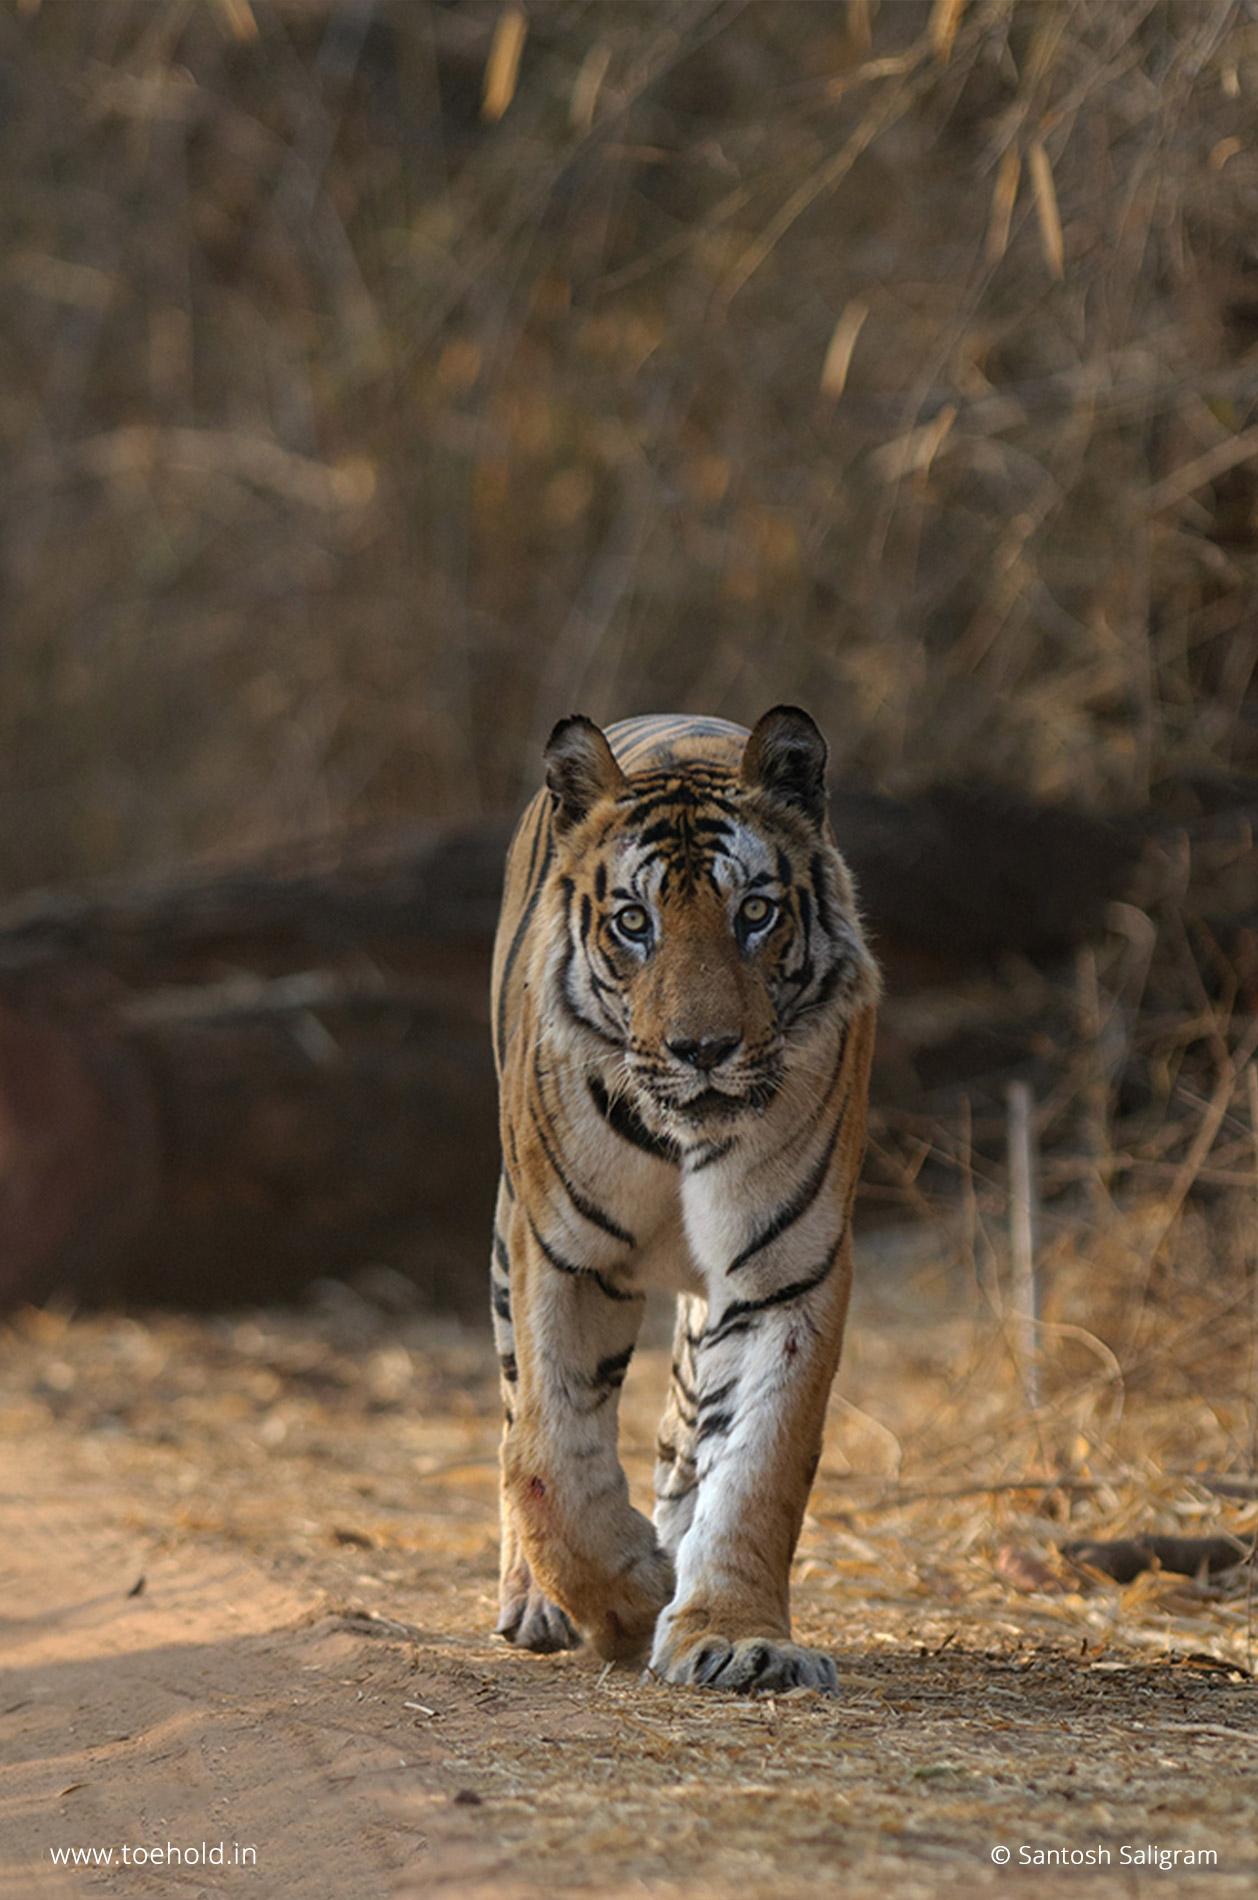 B2 tiger